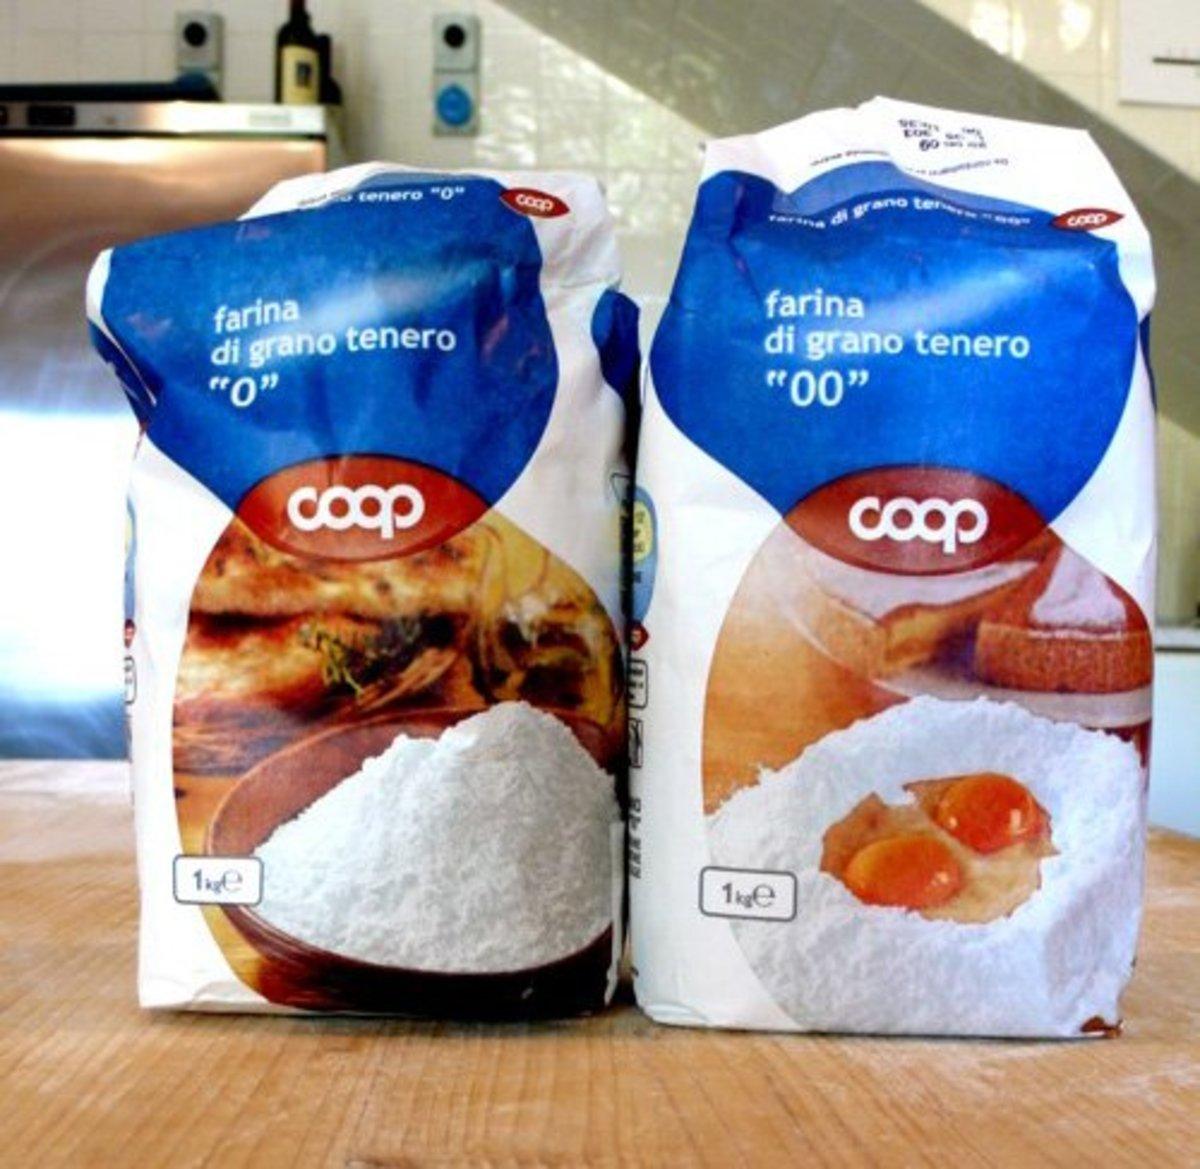 """00"" wheat floour is the top choice when making handmade pasta dough."